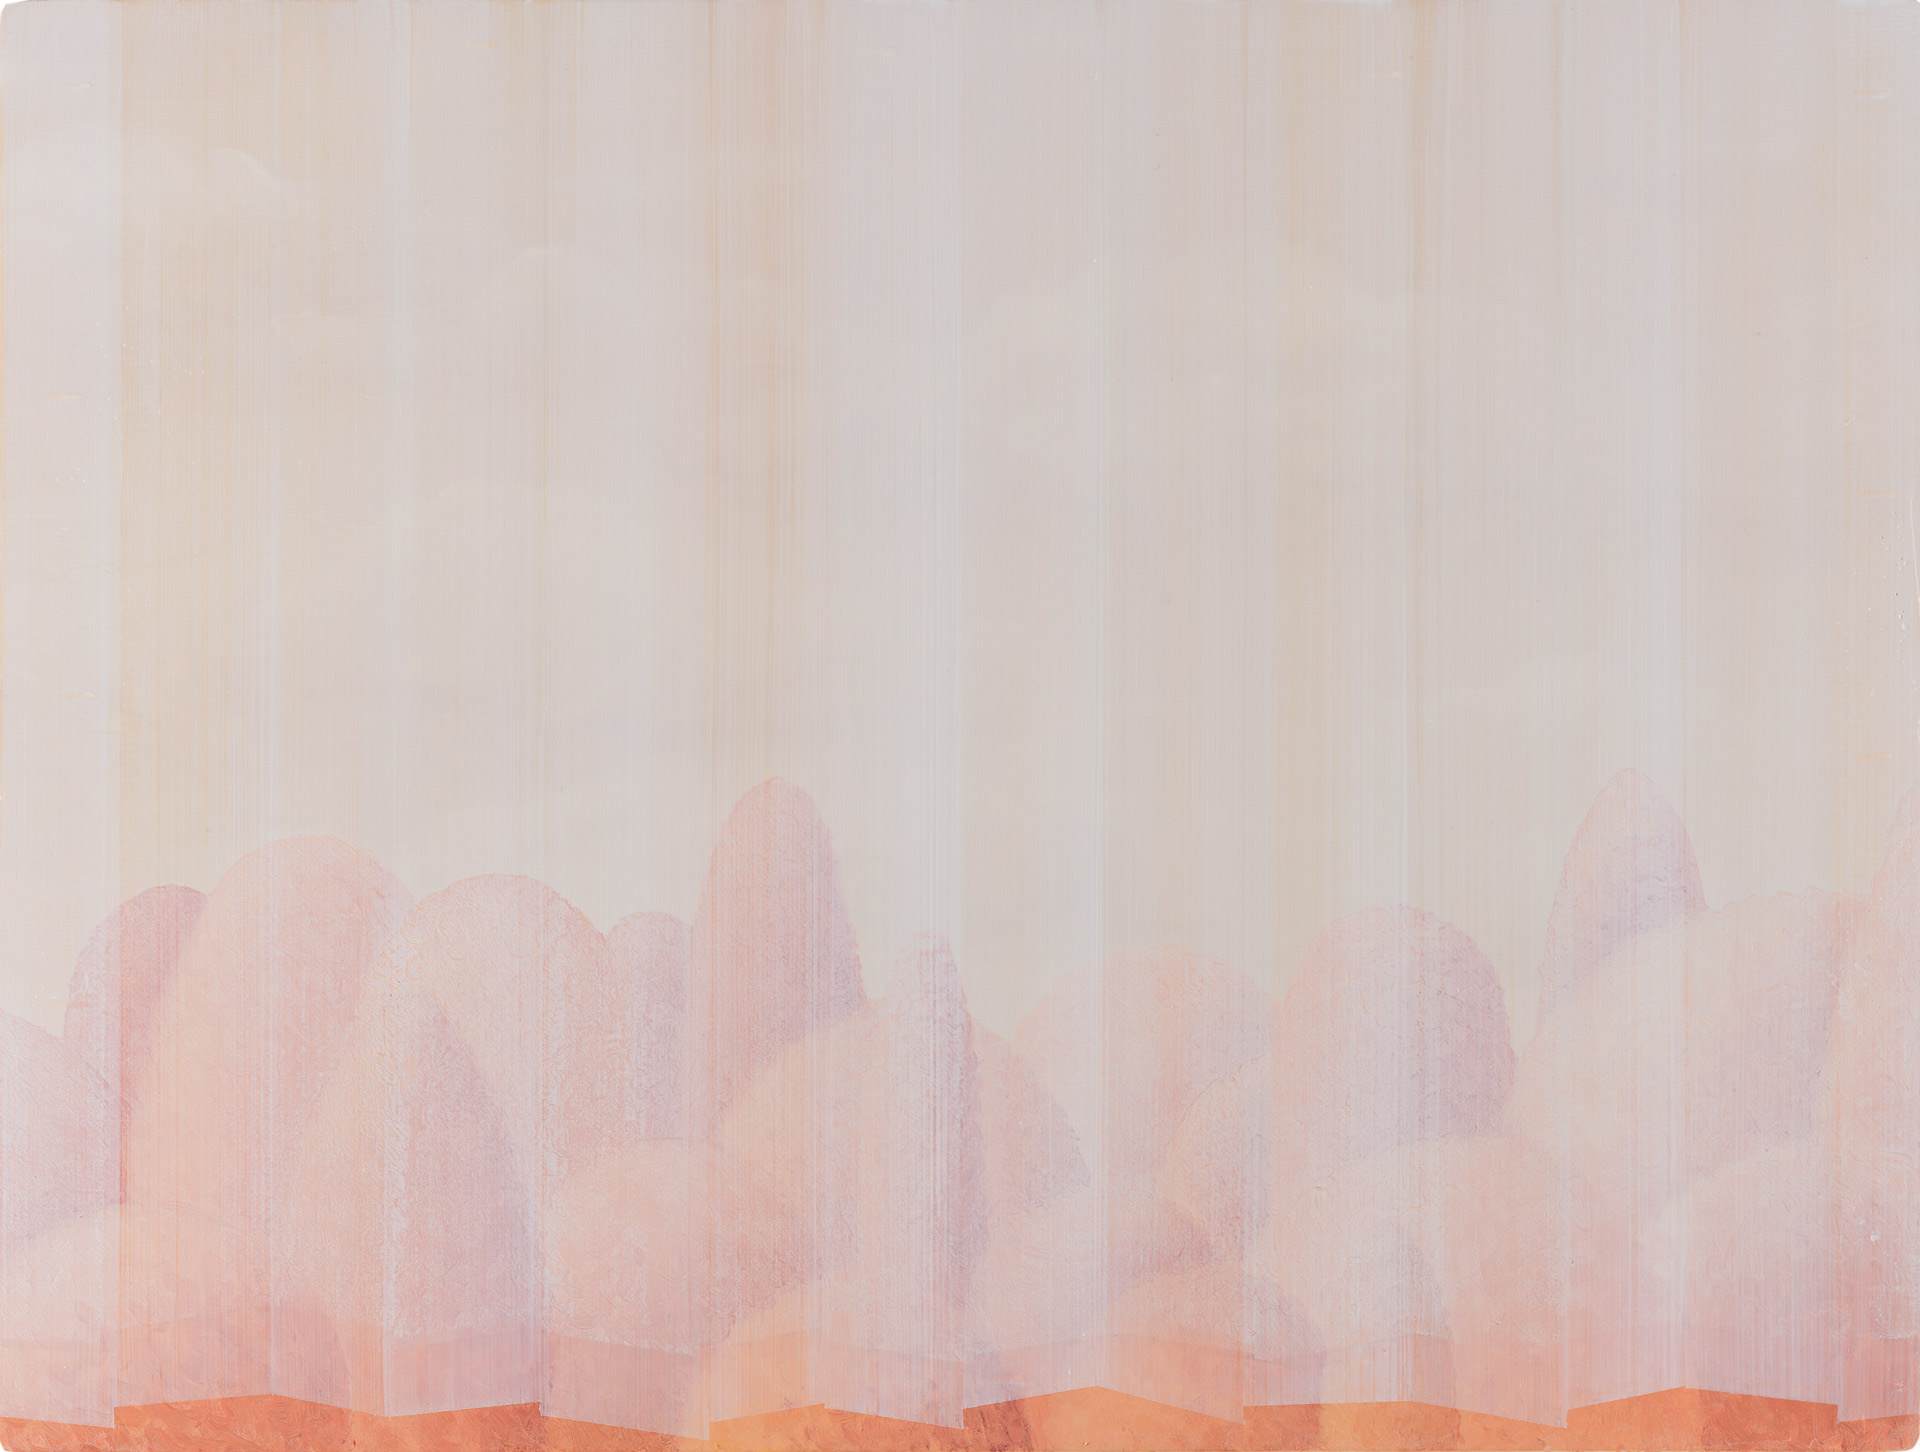 Untitled/30 x 40 cm, Oil on wood/2019